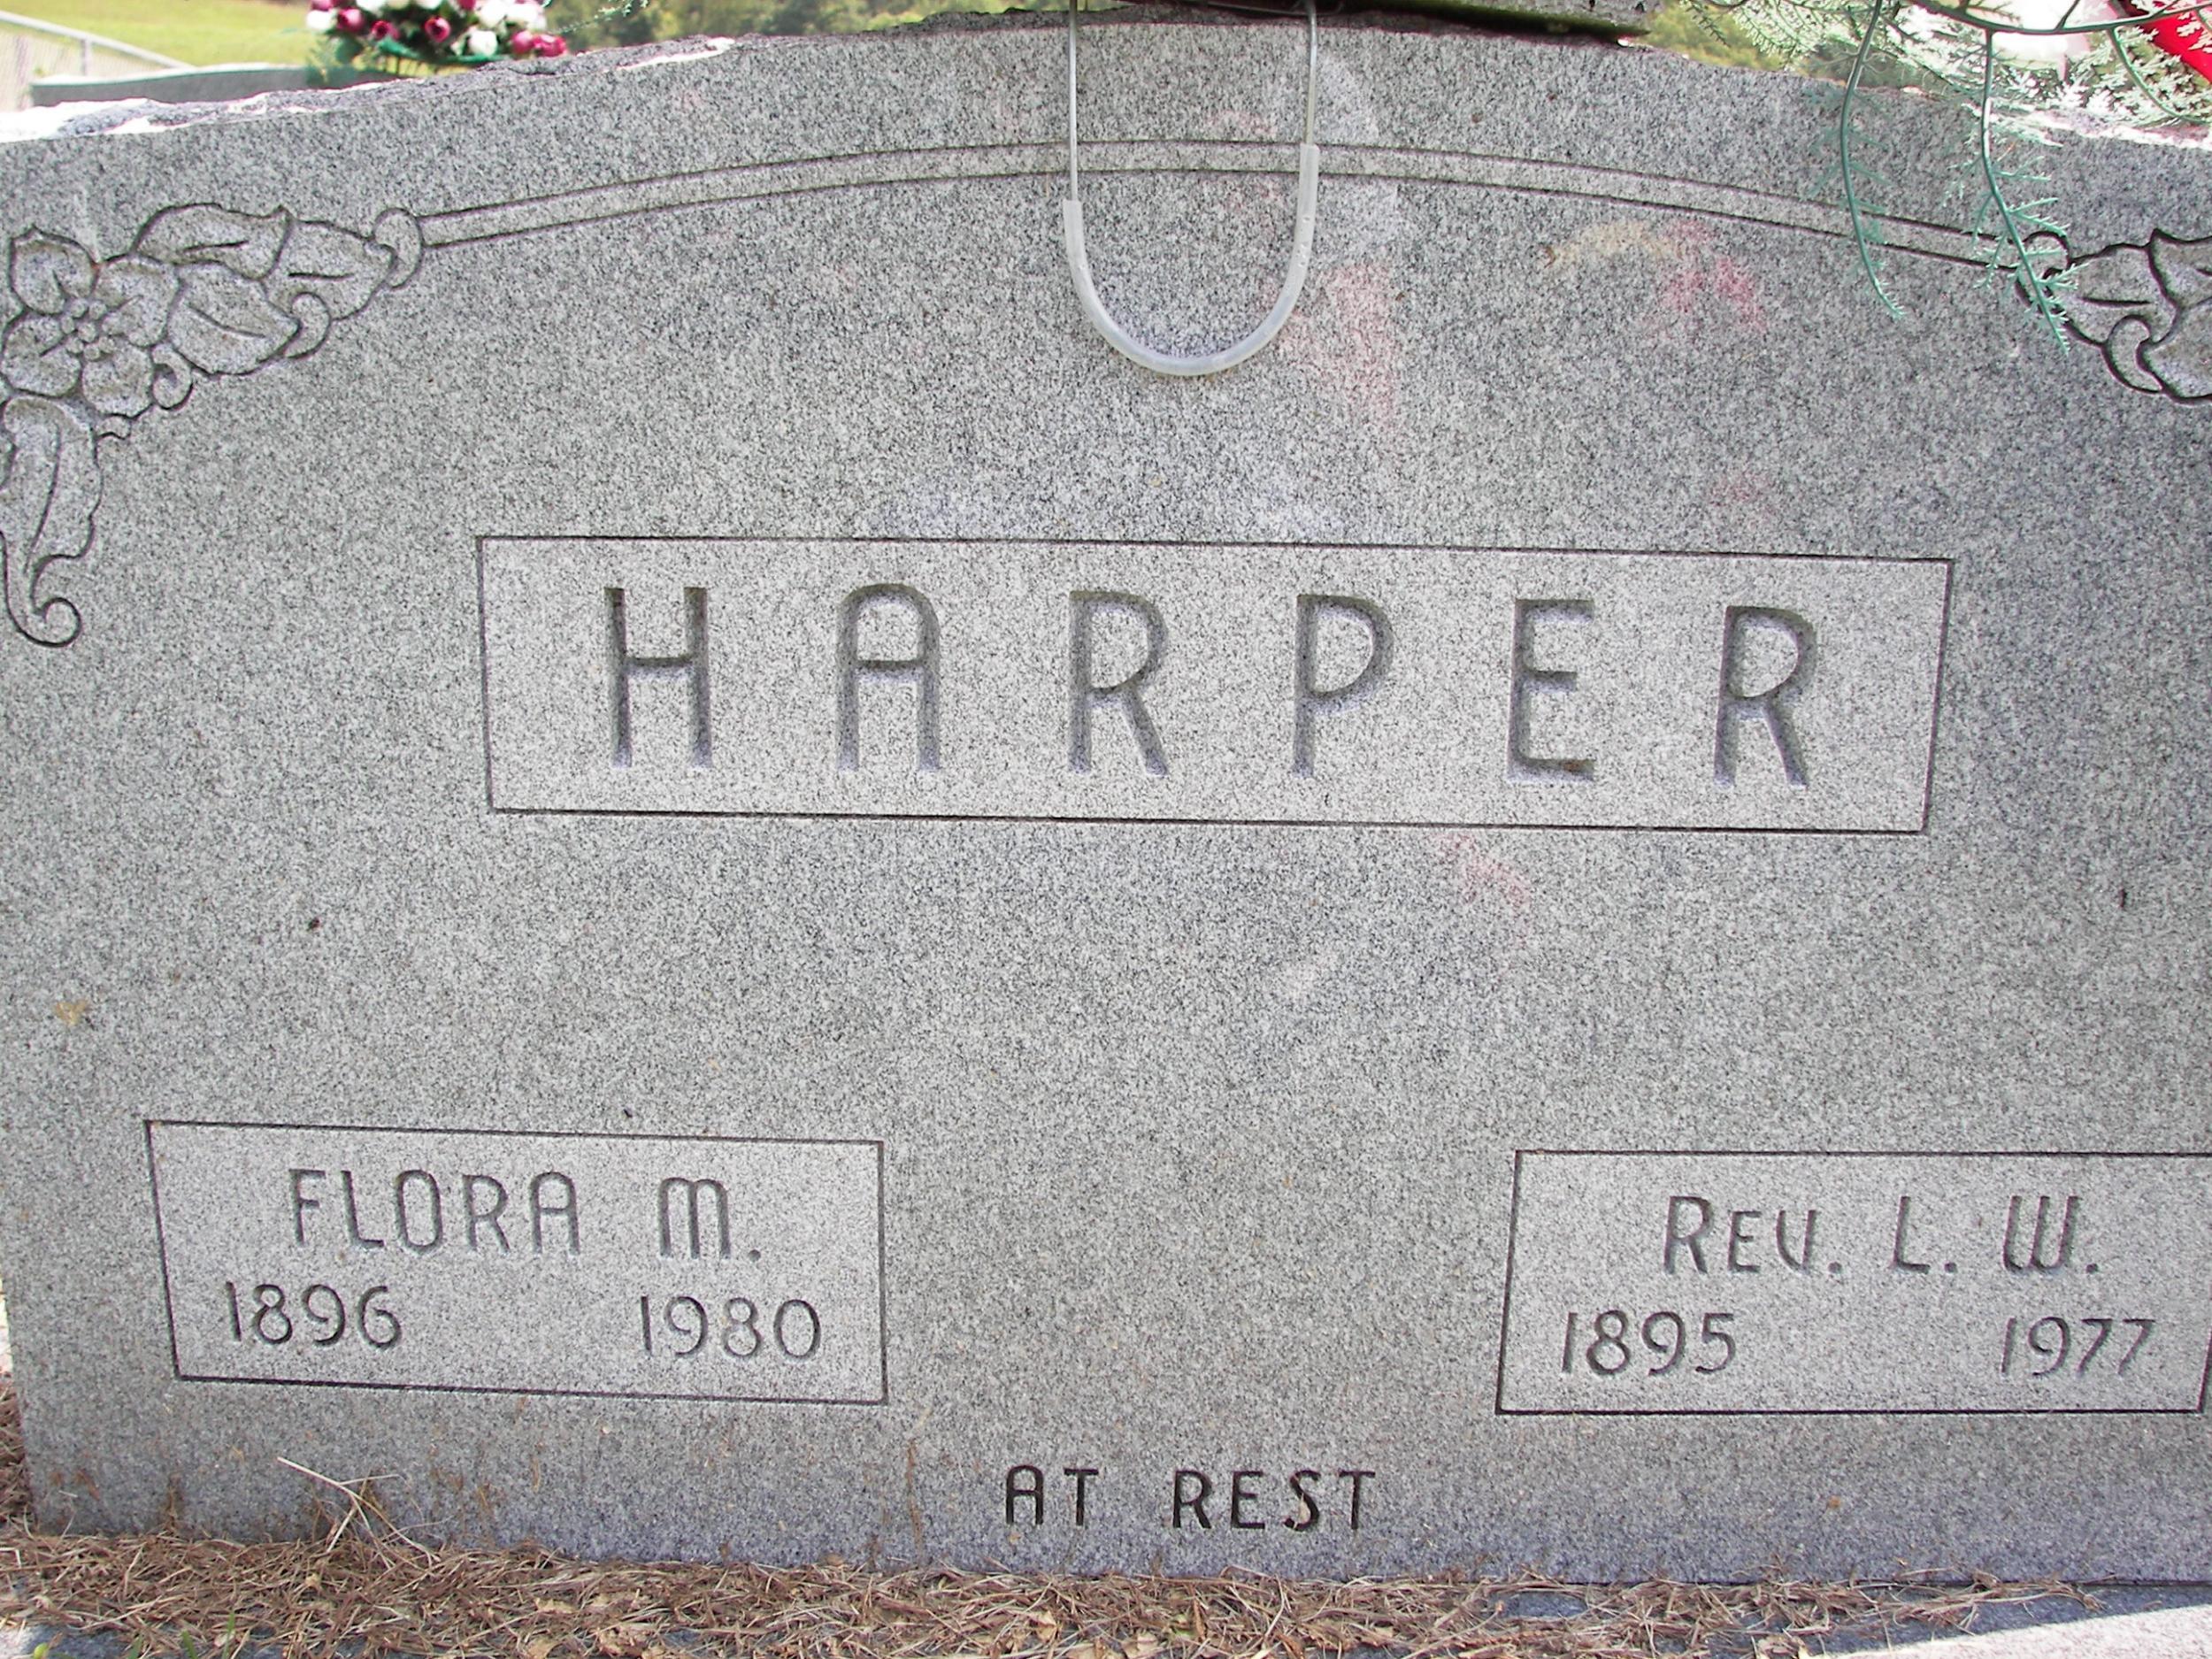 Rev Luster W and Flora Mae Harper grave marker